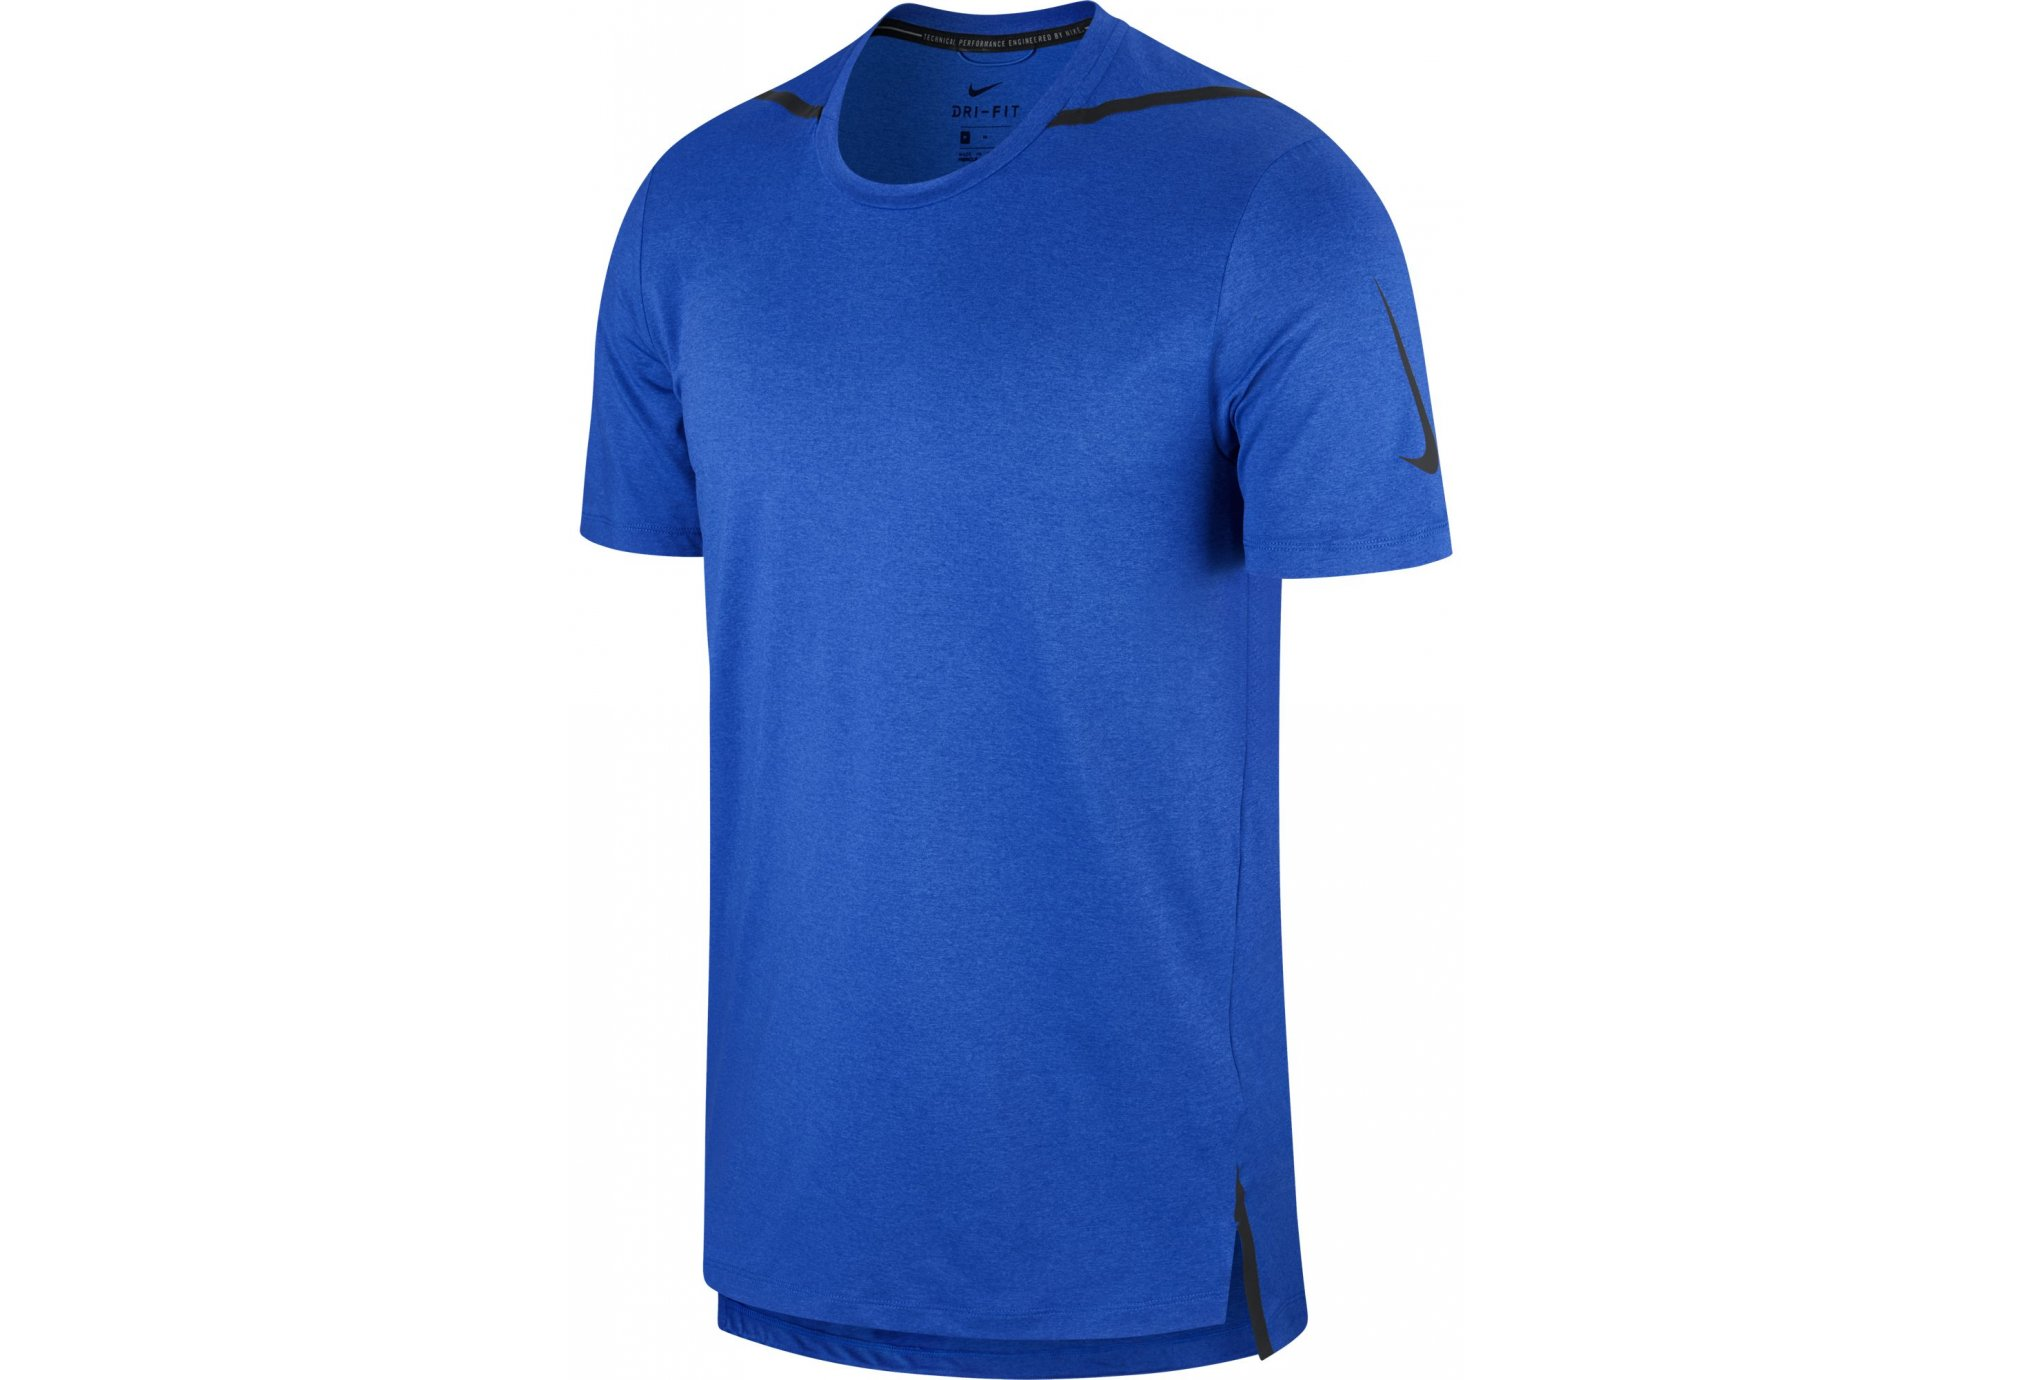 Nike Dry Max M vêtement running homme